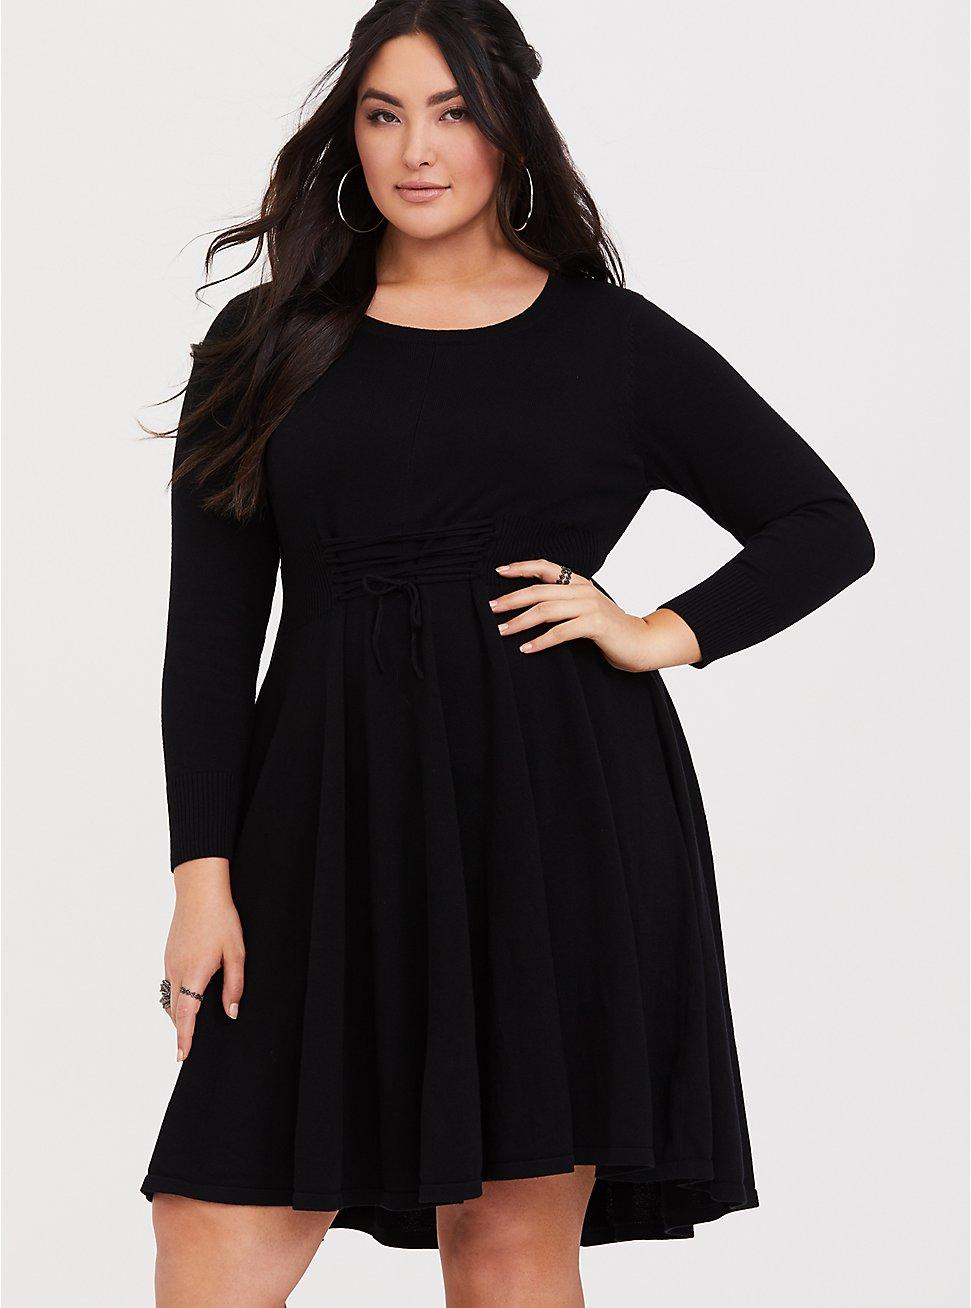 Black Lace Up Sweater Dress